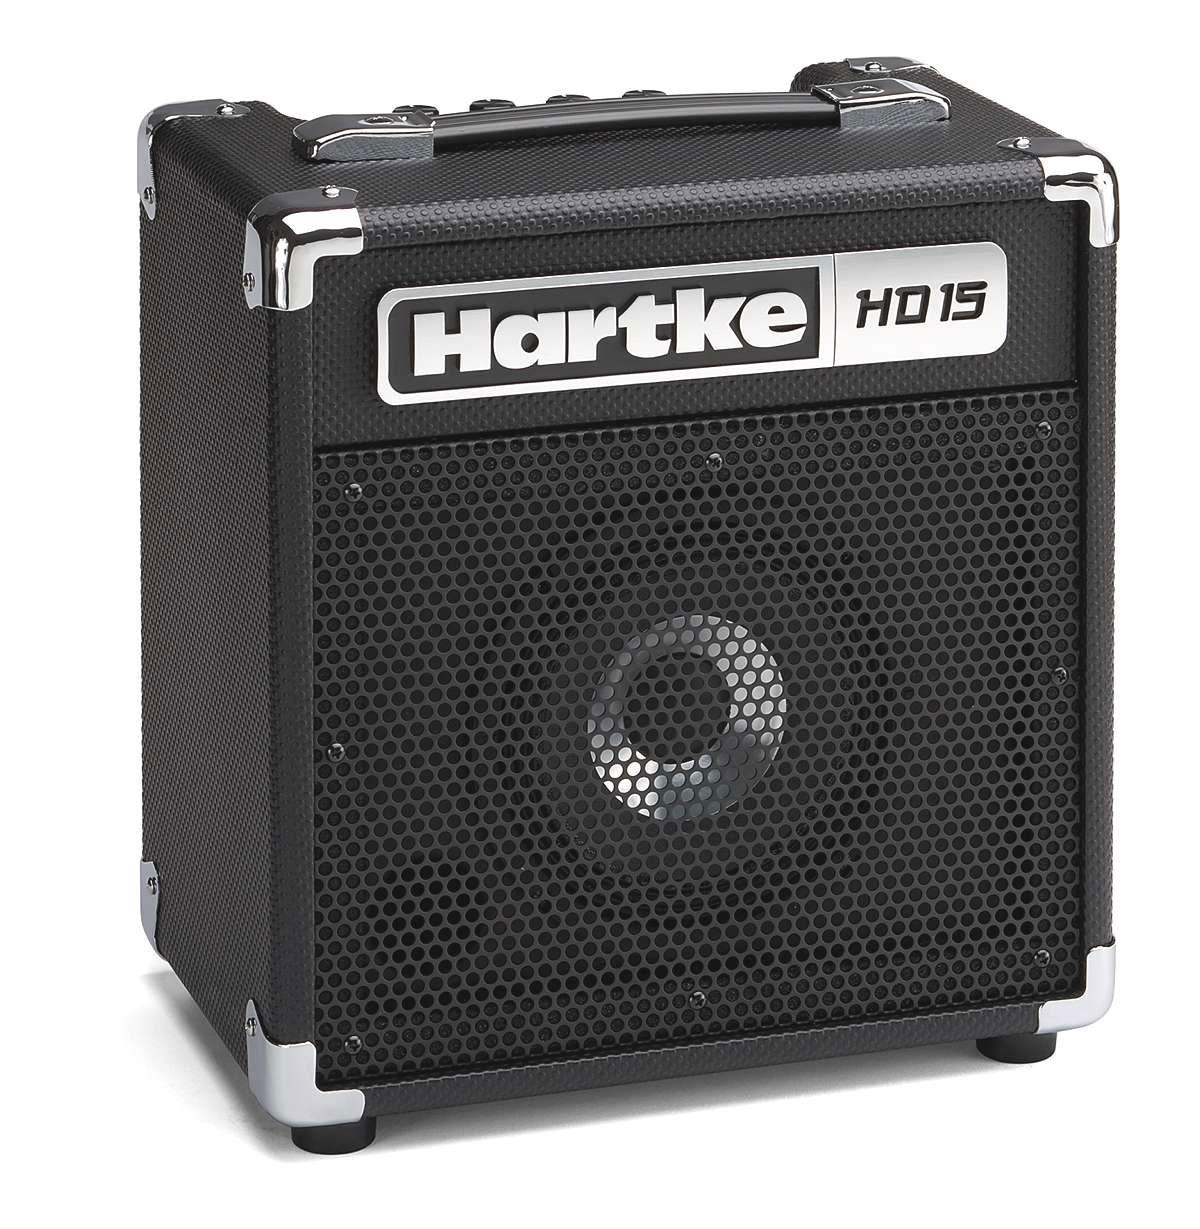 Hartke Hd15 - Combo Basse 1x6.5 - 15w